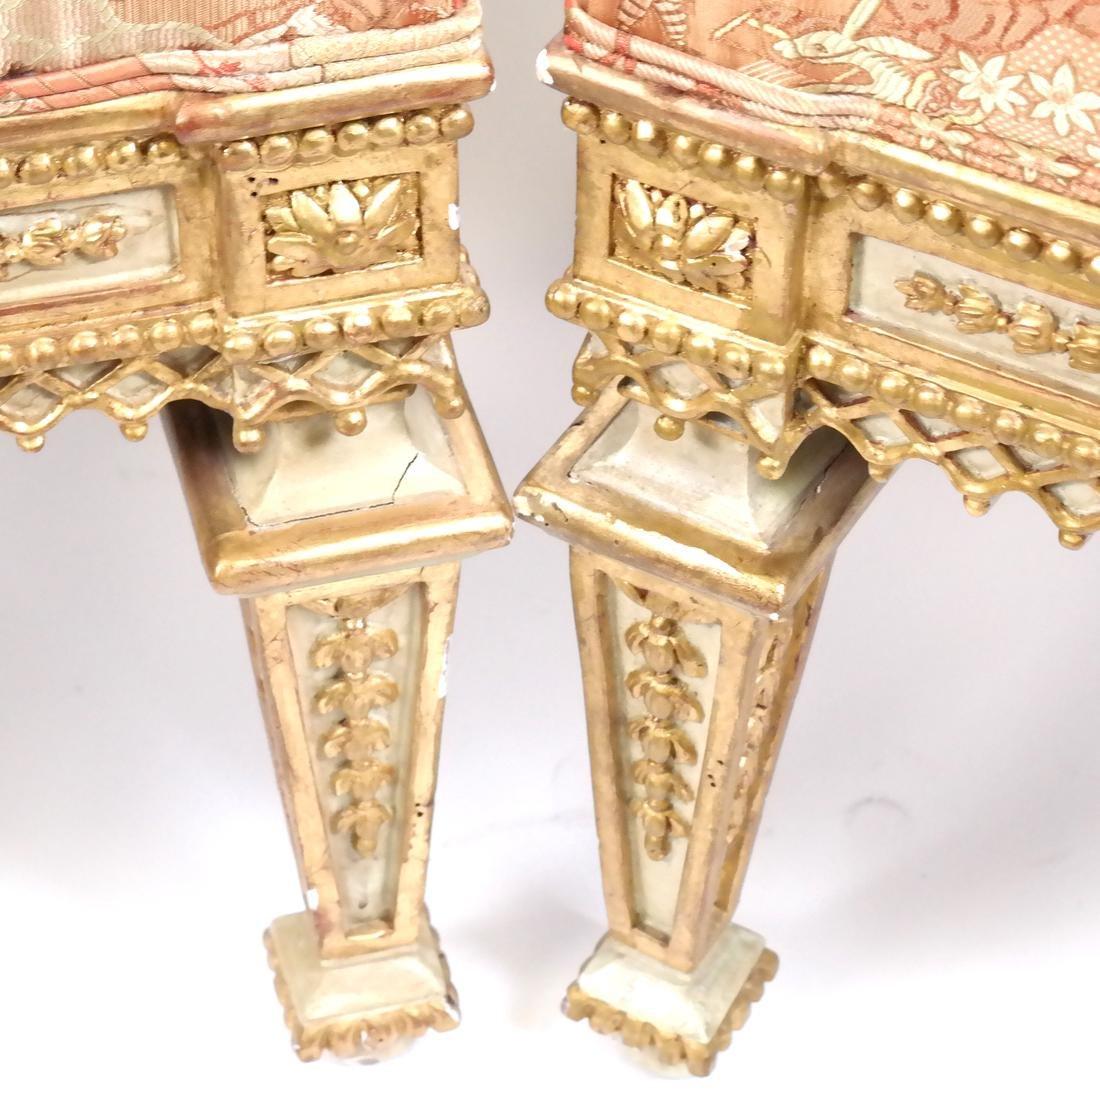 Pair of 19th Century Classical Stools - 4